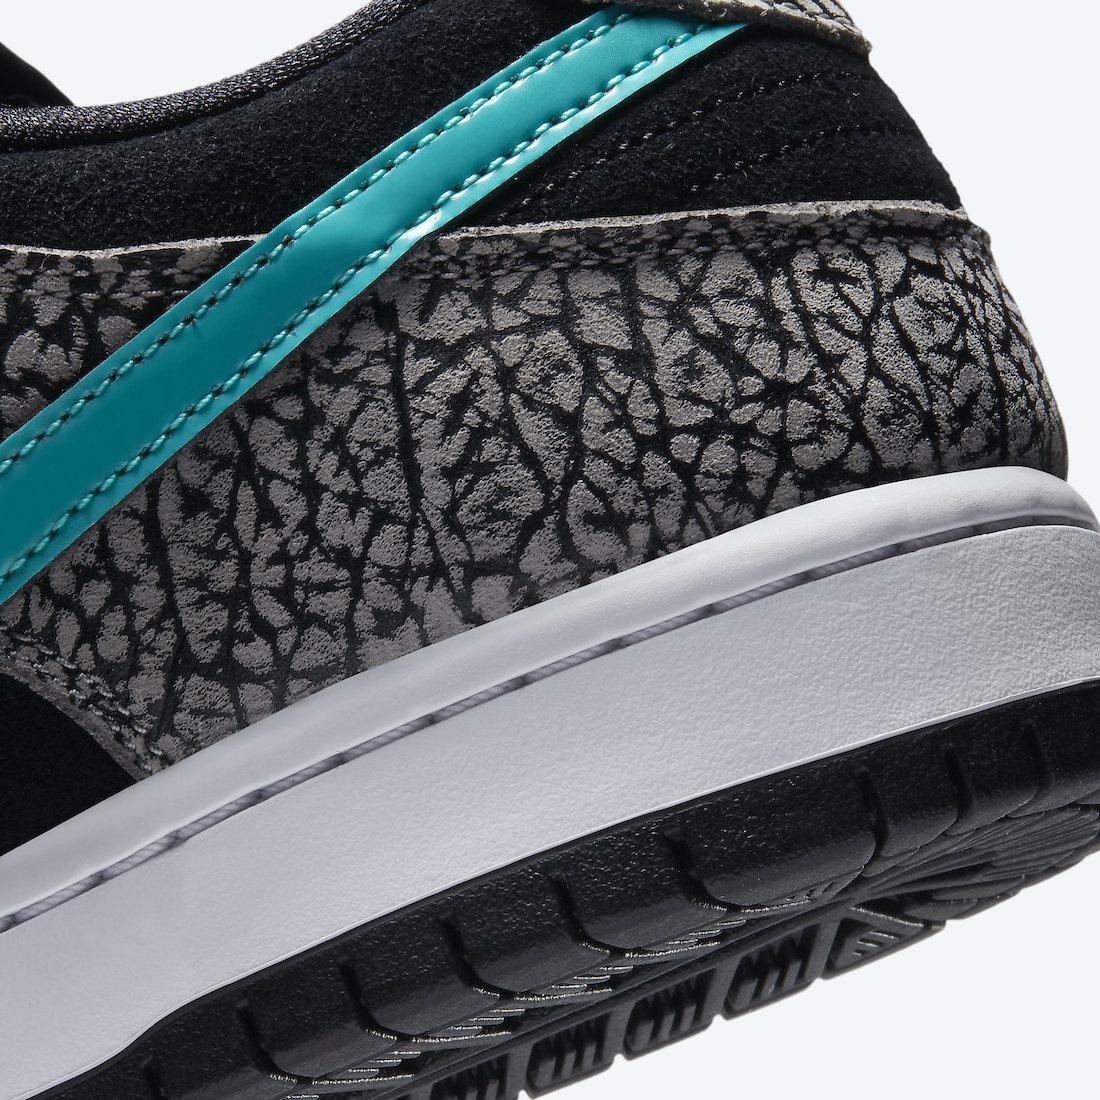 Nike-SB-Dunk-Low-Elephant-BQ6817-009-Release-Date-Price-8